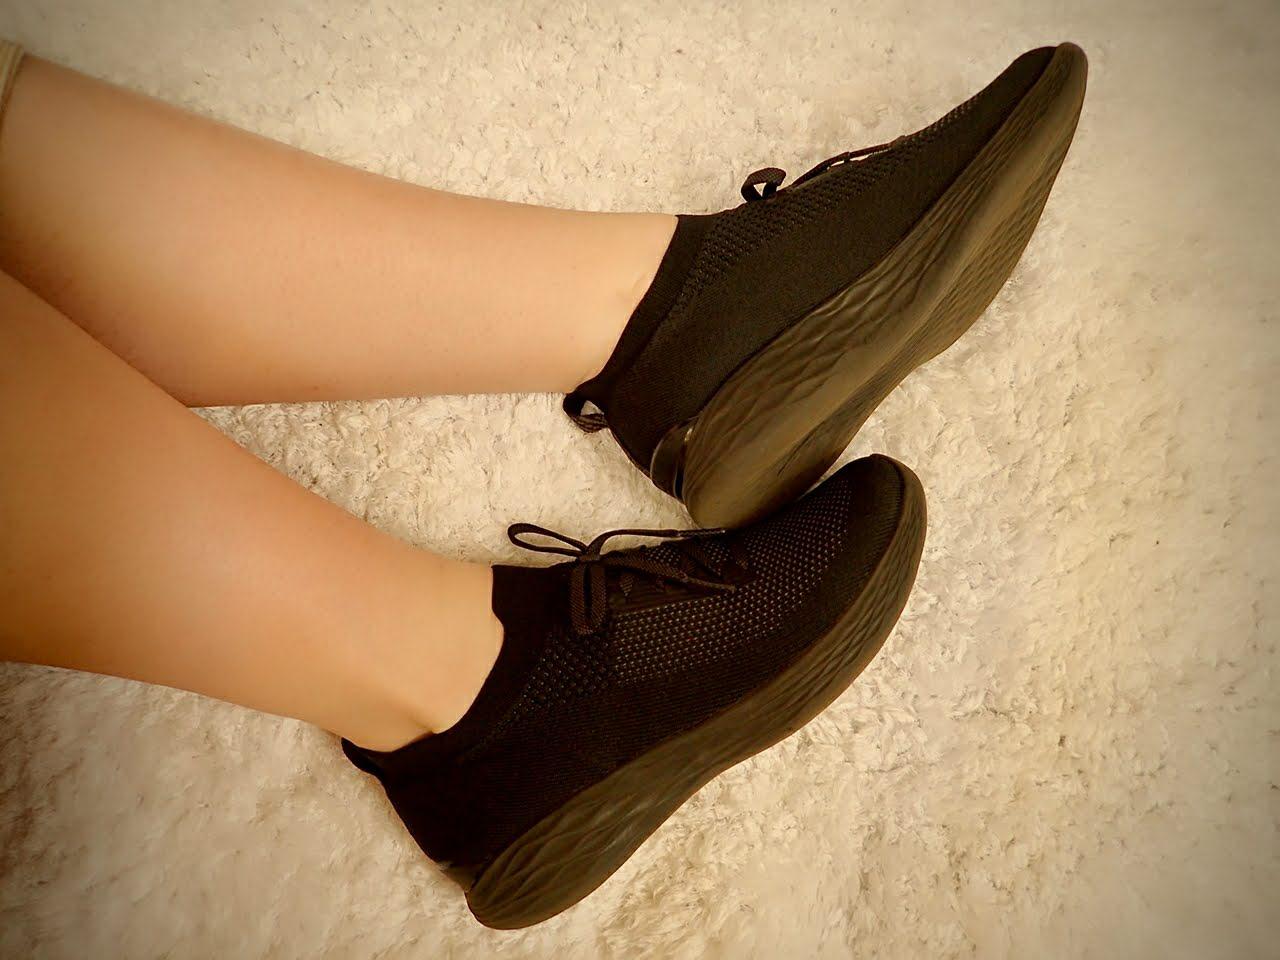 Skechers shoes in black.